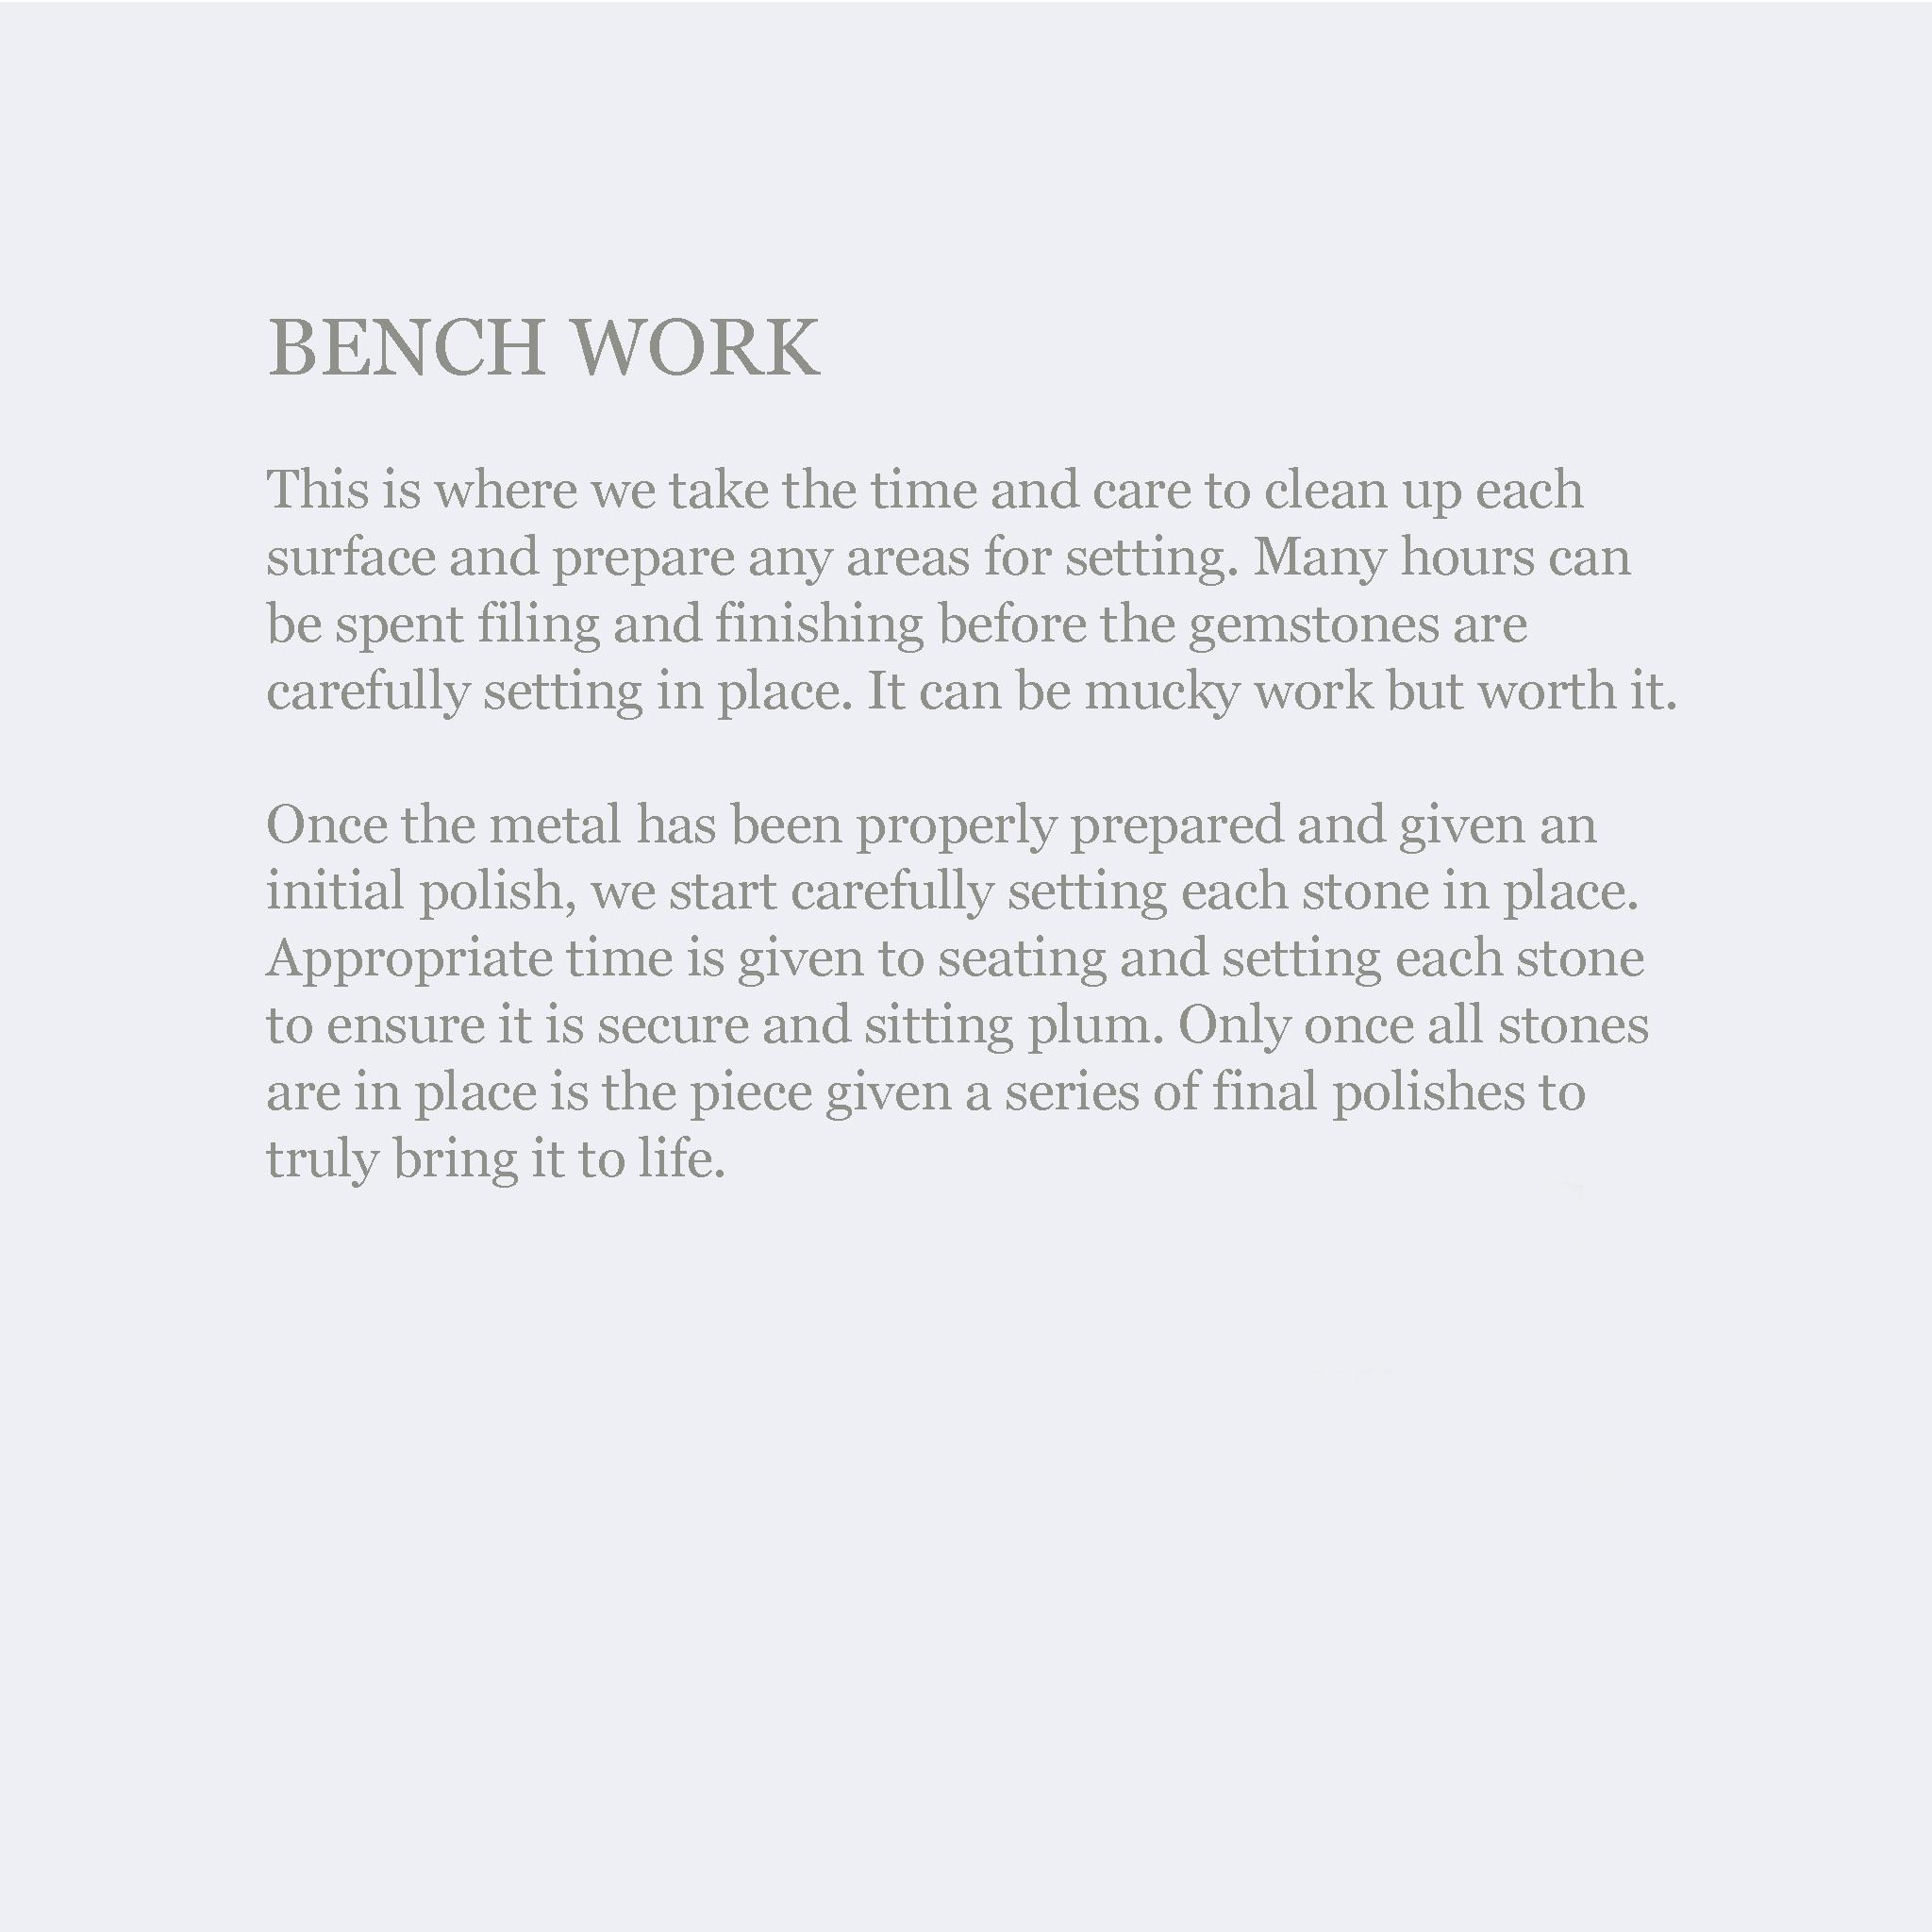 Benchwork_text.png